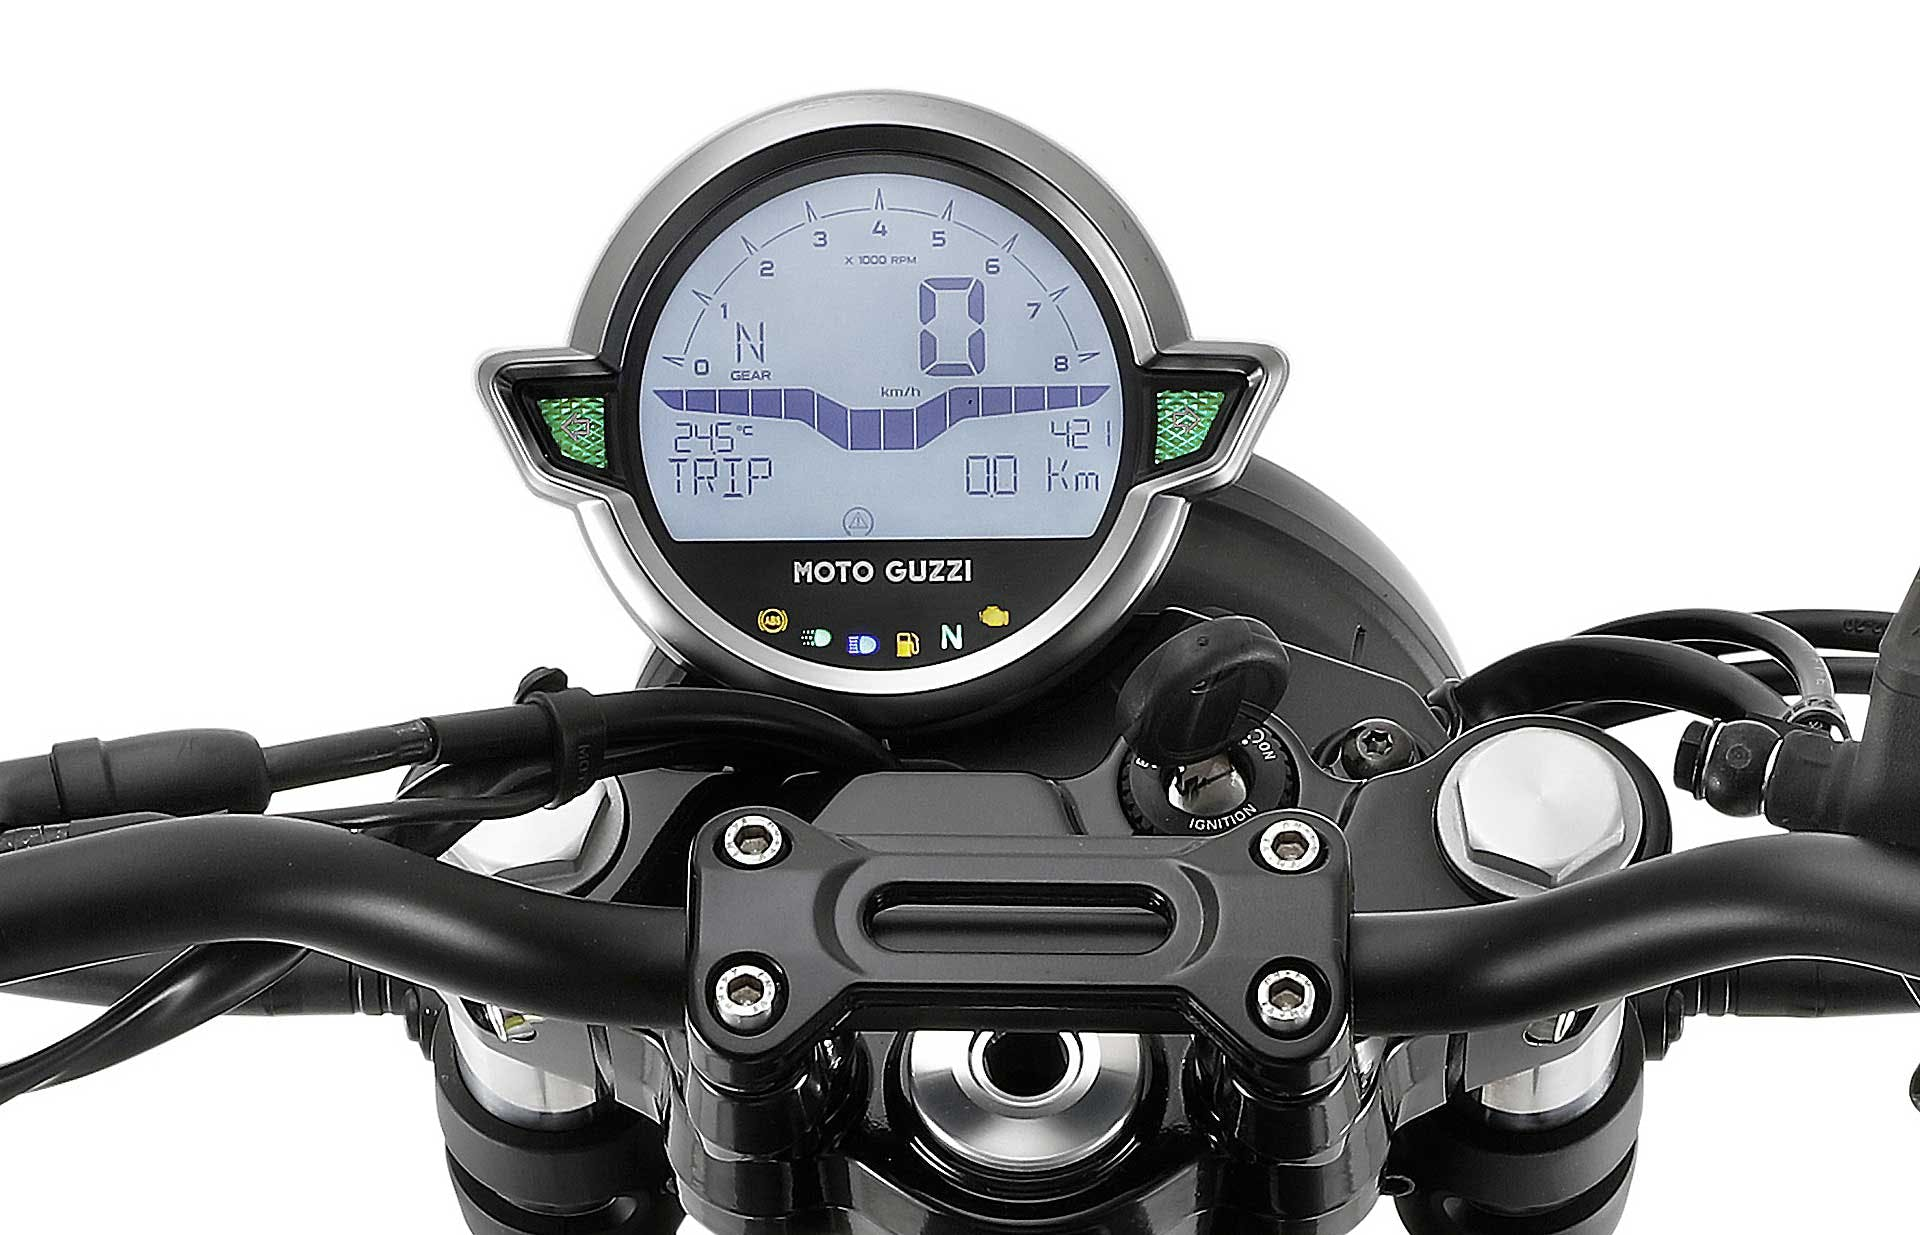 Moto Guzzi V7 850 2021 strumentazione digitale